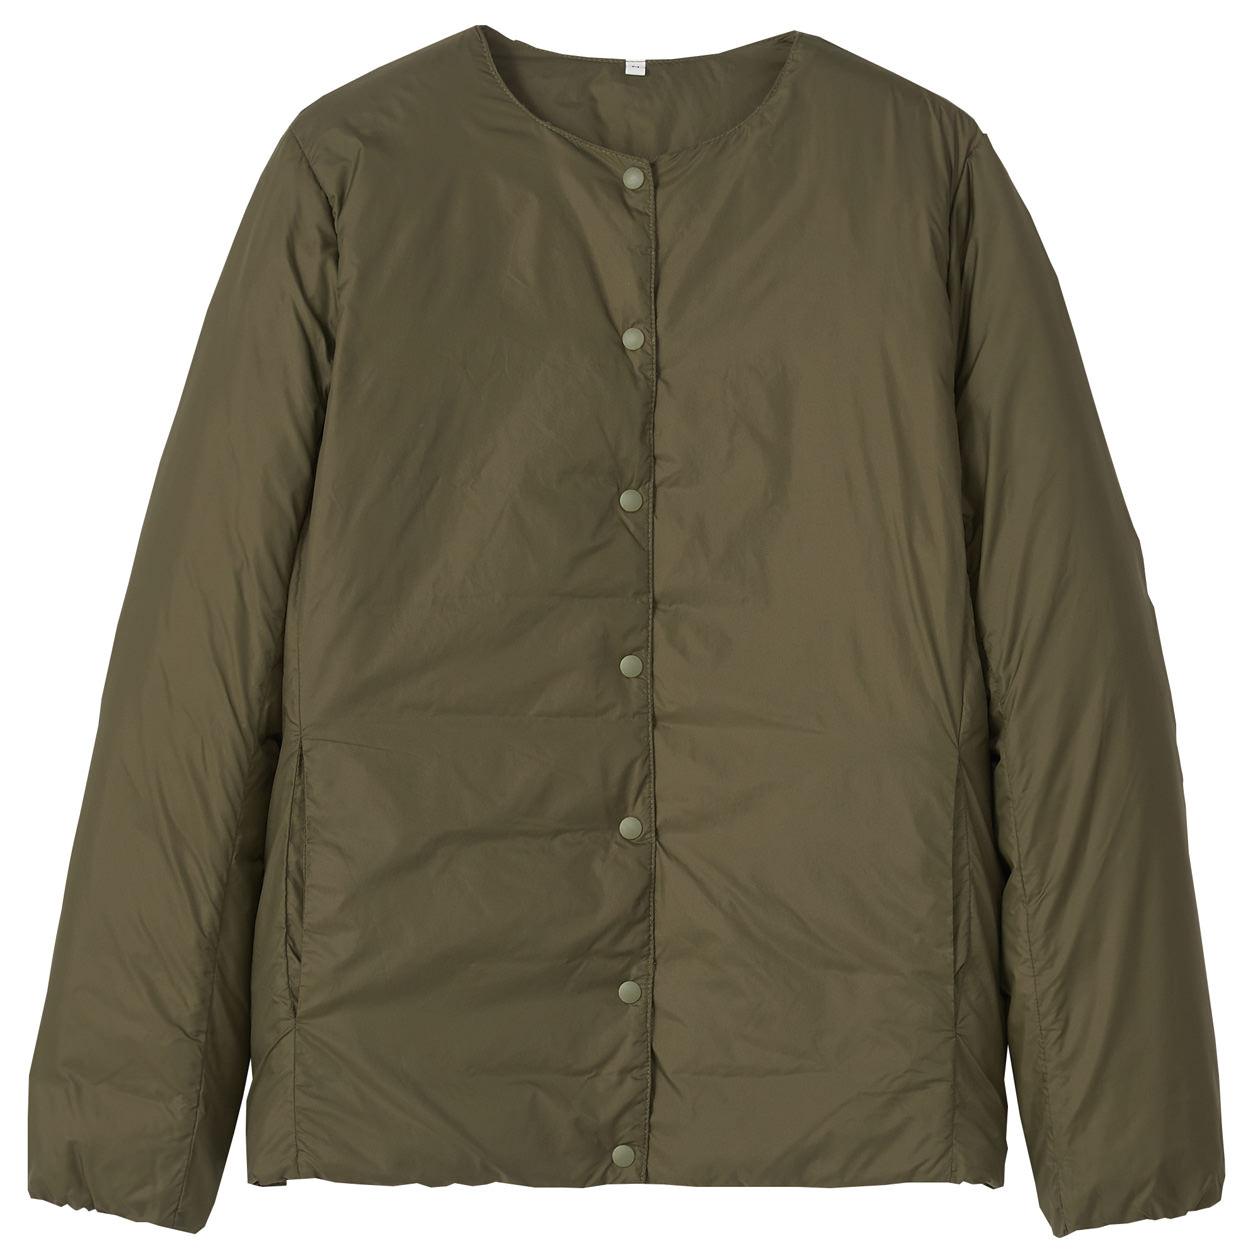 Lightweight Australian Down Pocketable Collarless Smoky Green, U.P. $69-$99 (Less 10%)